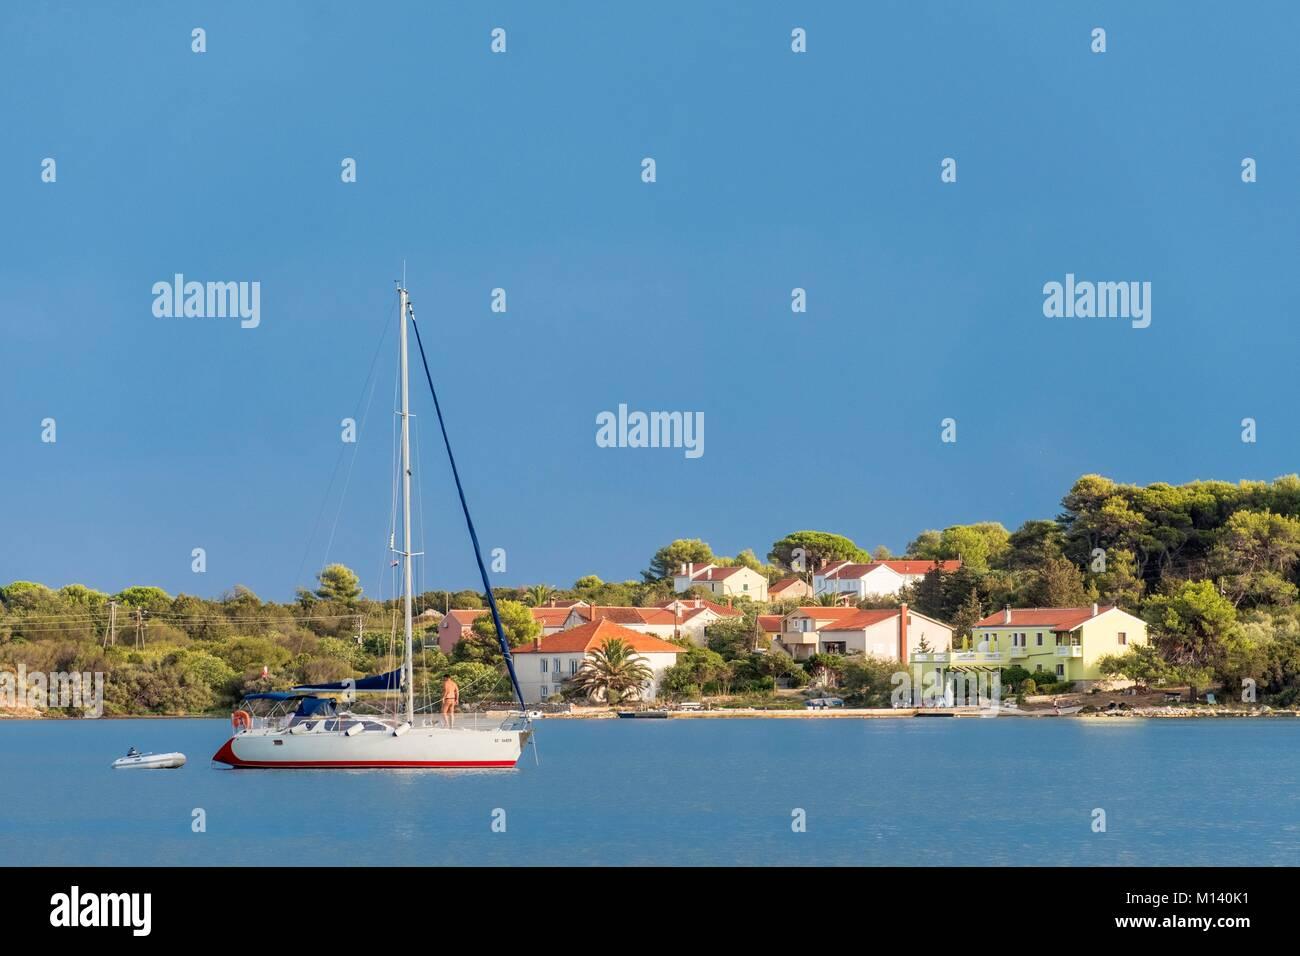 La Croatie, Dalmatie du Nord, de la côte dalmate, archipel de Zadar, l'île de Dugi Otok, Verunic Bay Photo Stock